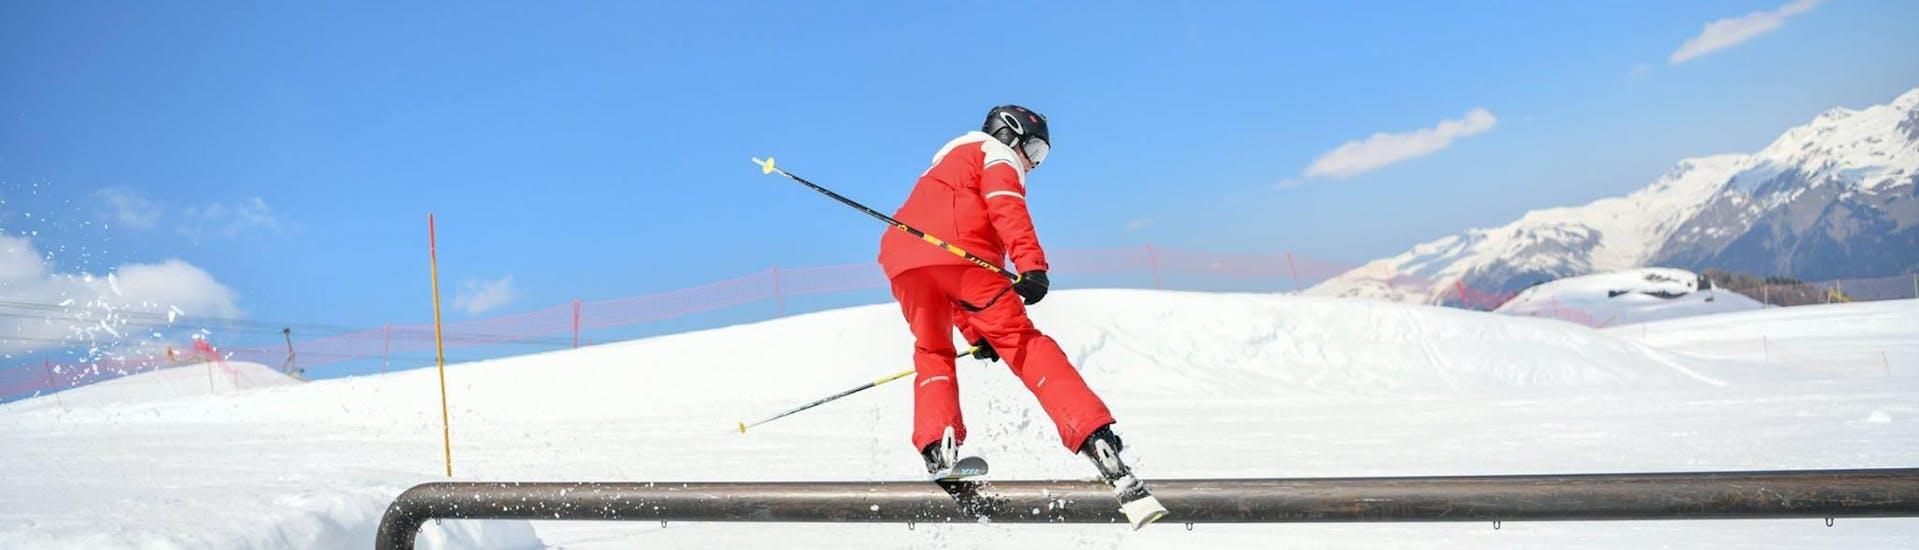 freestyle-skiing-lessons-14-yo-esf-la-plagne-hero